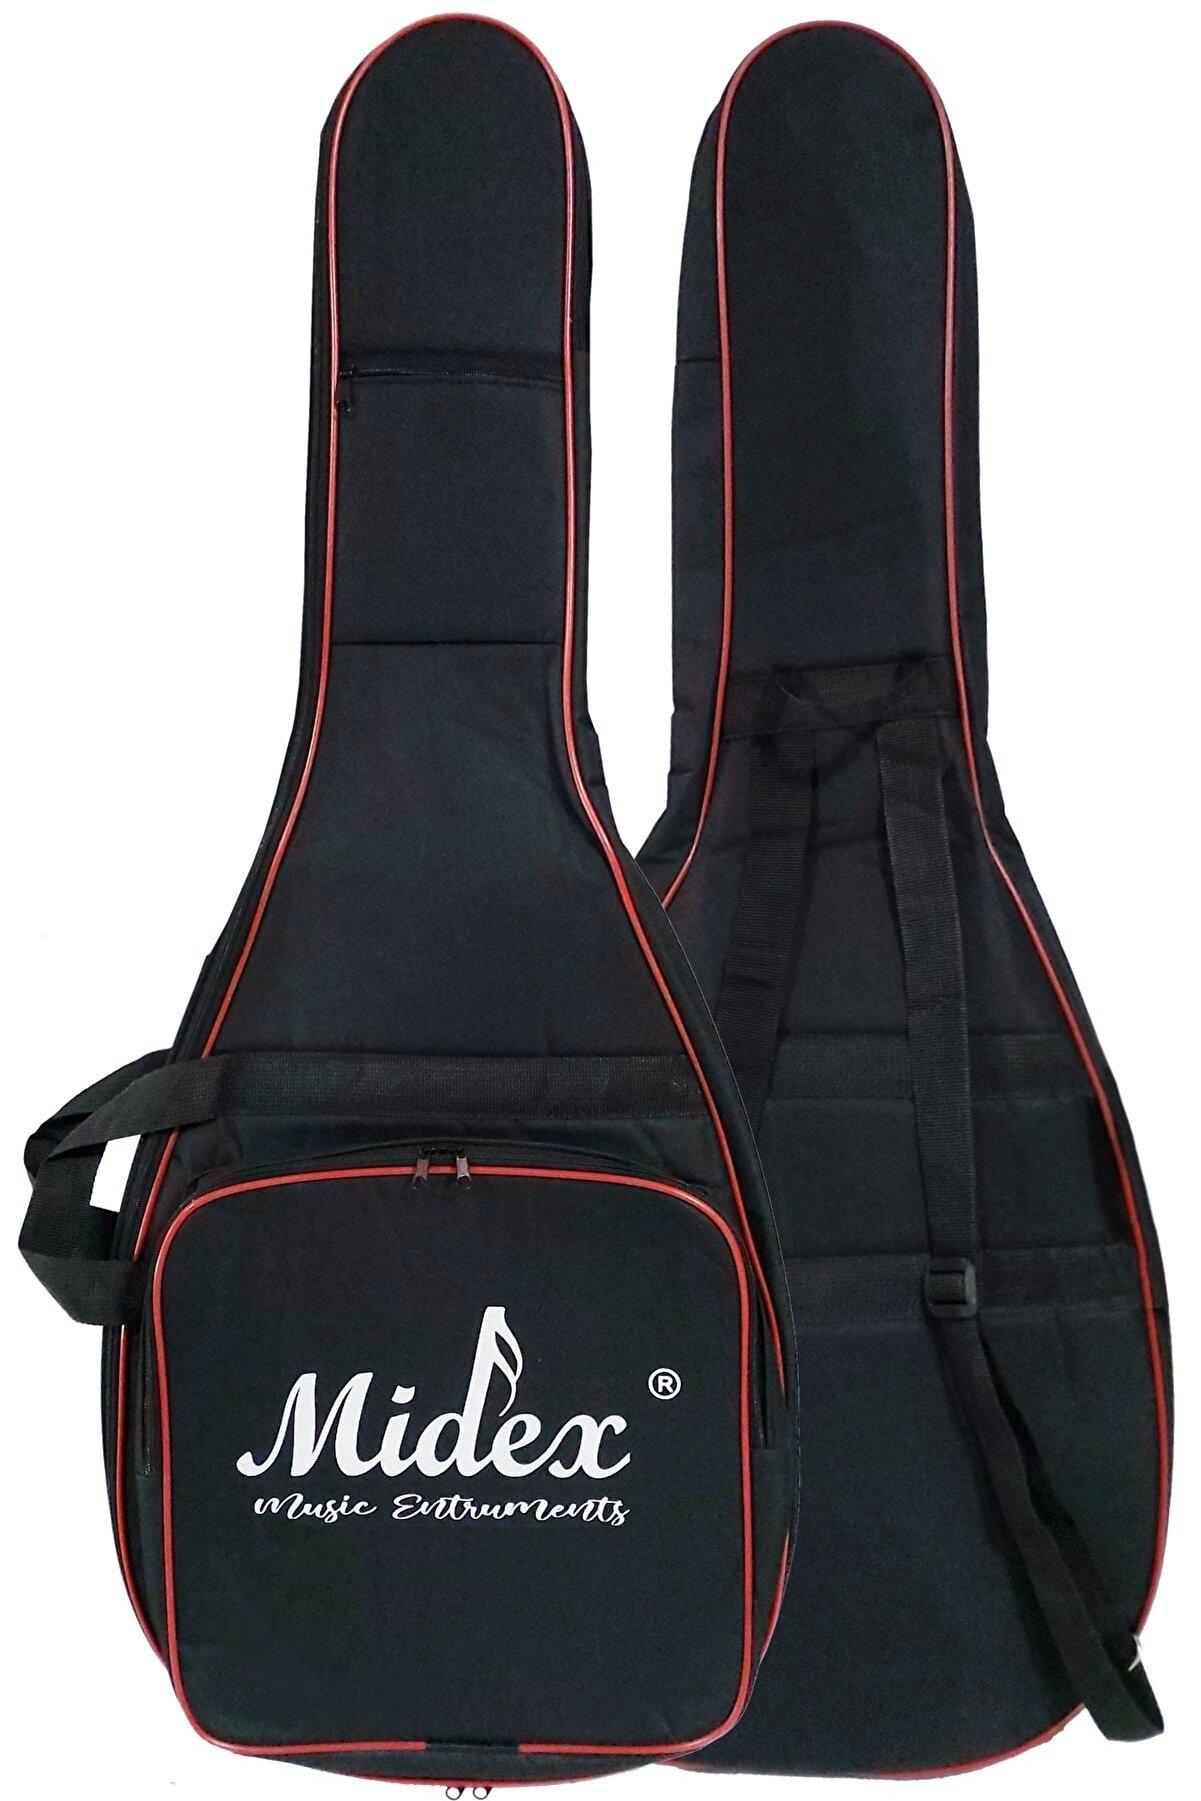 Lastvoice Midex Cls-40 Klasik Gitar Çanta Soft Case (KALIN KILIF)